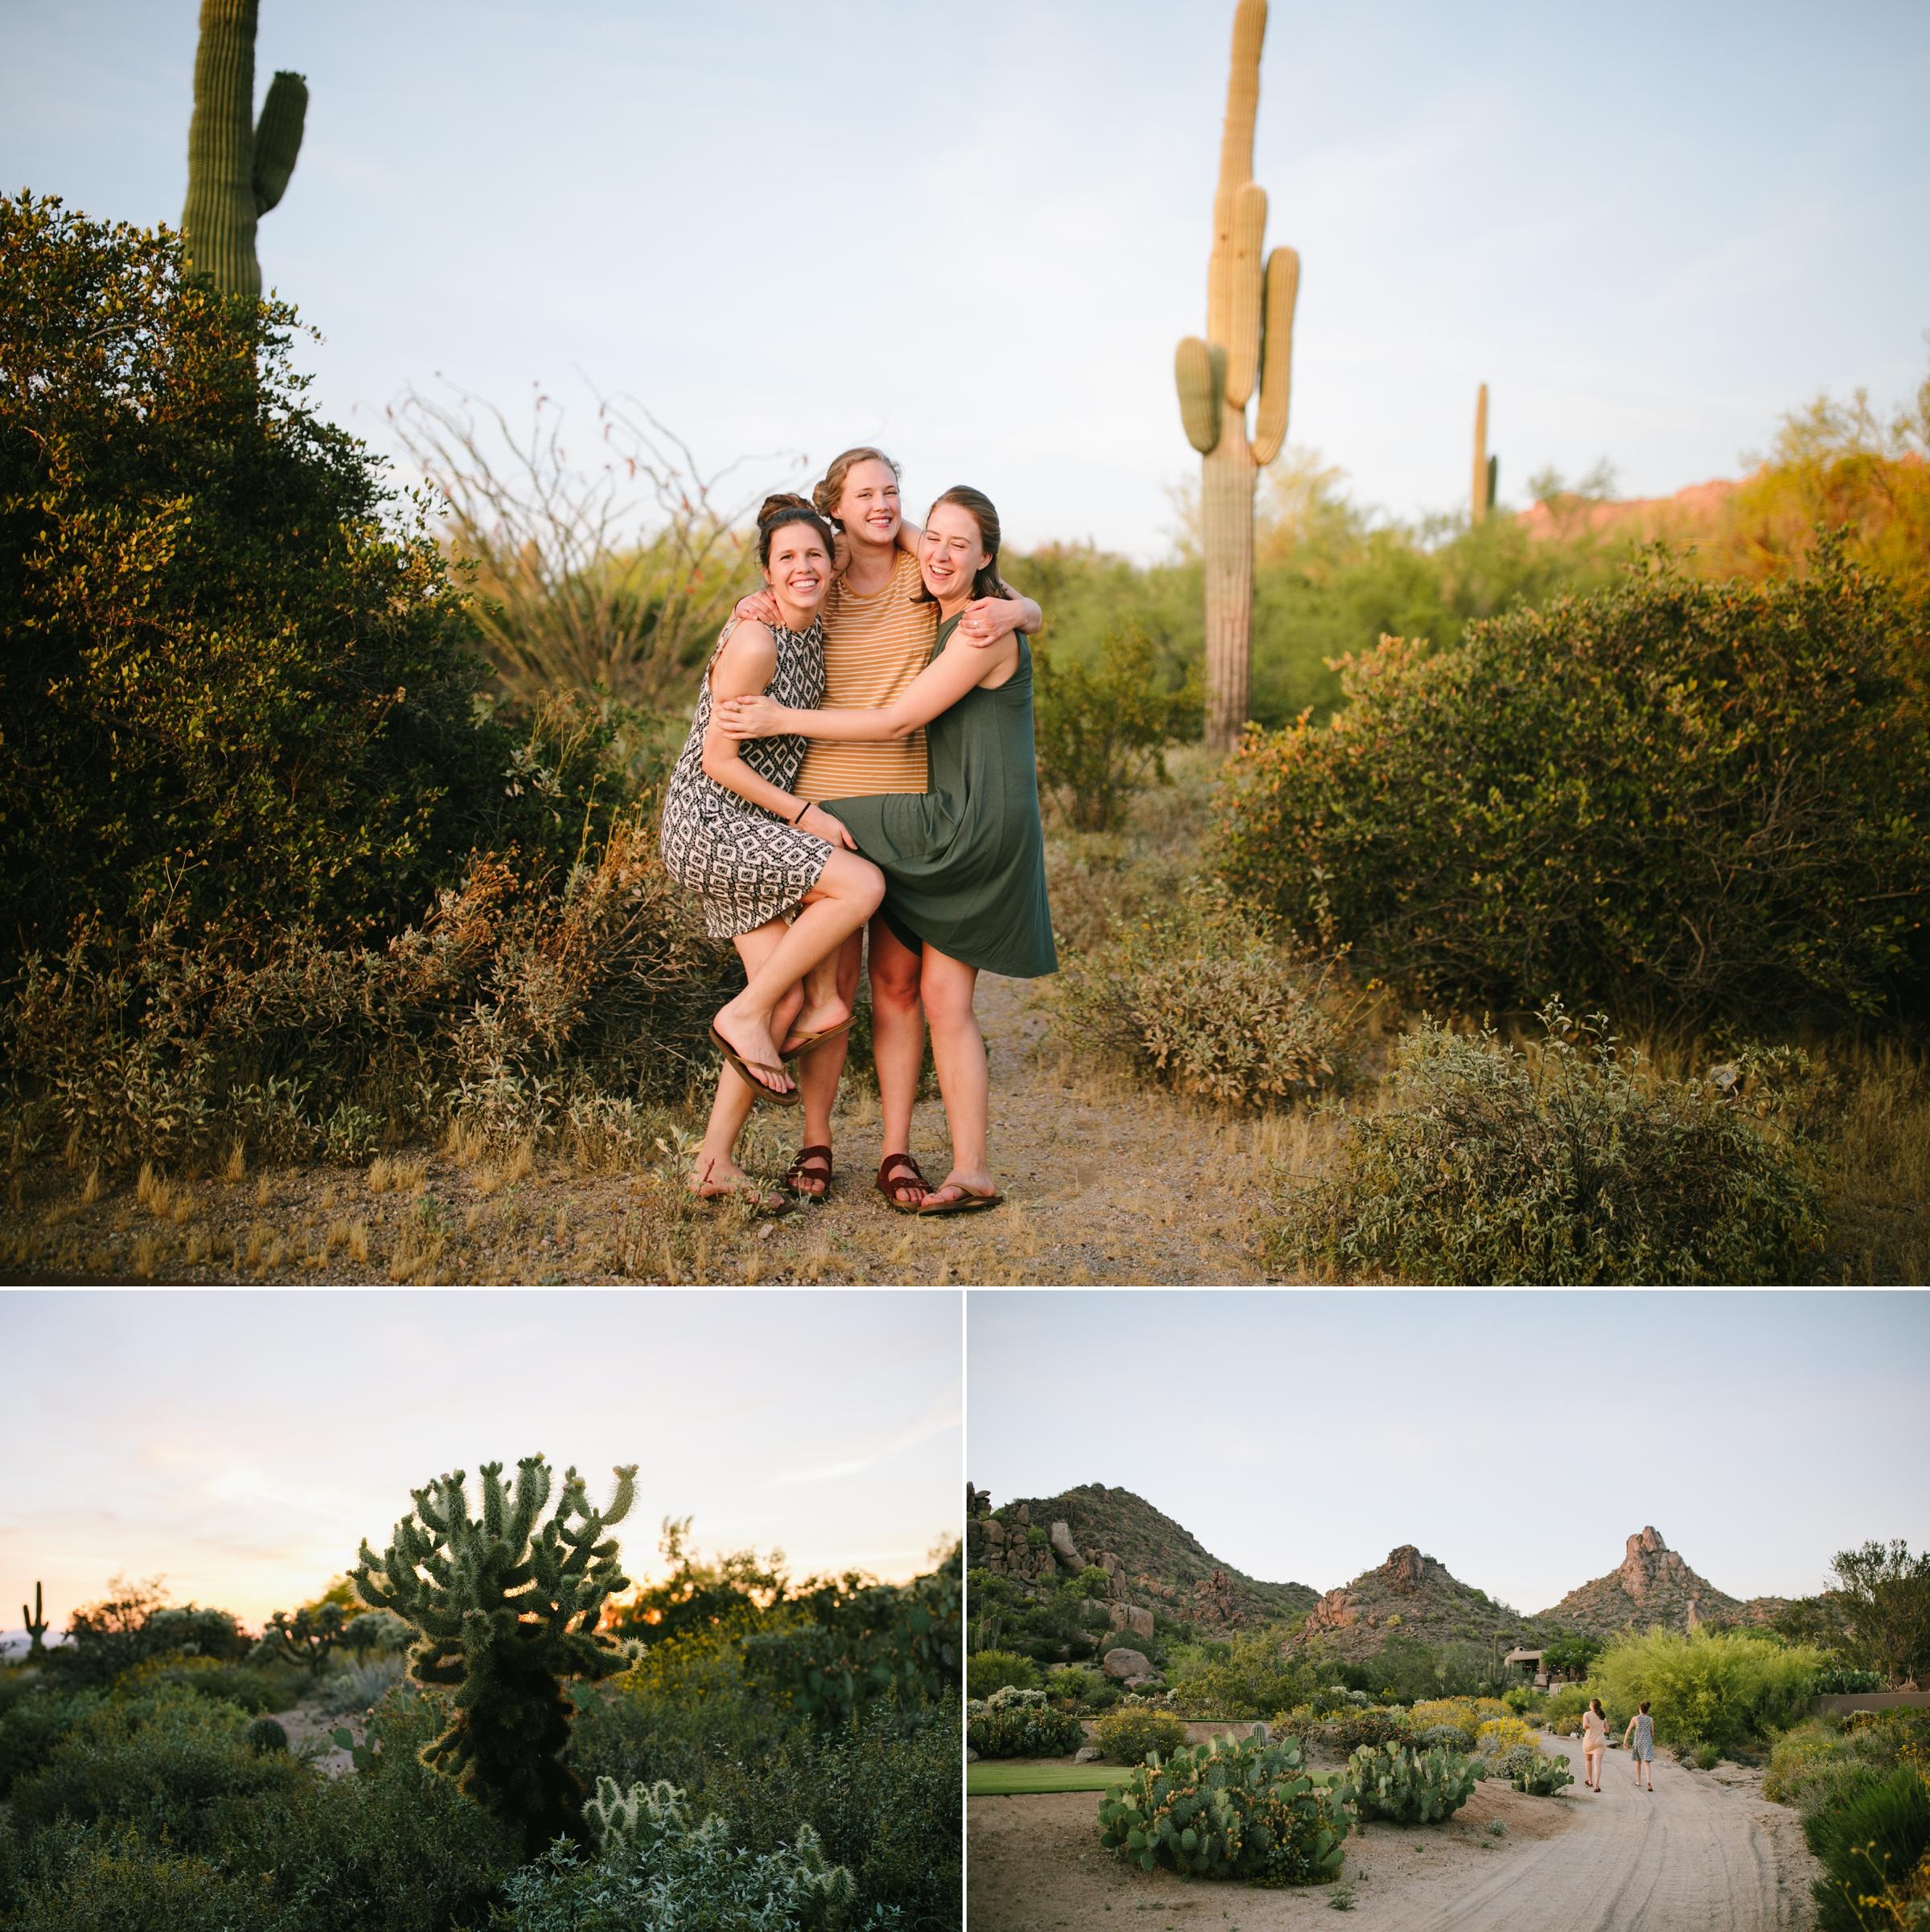 catie-bergman-arizona-southwest-hipster-seattlefamily-seattle-family-pnw-first-birthday-lifestylephotography-catie-bergman-photography-elopement-landscape-travel-wedding-pnw-portrait-lifestylephotography-vsco-northwest-friends-love_0010.jpg